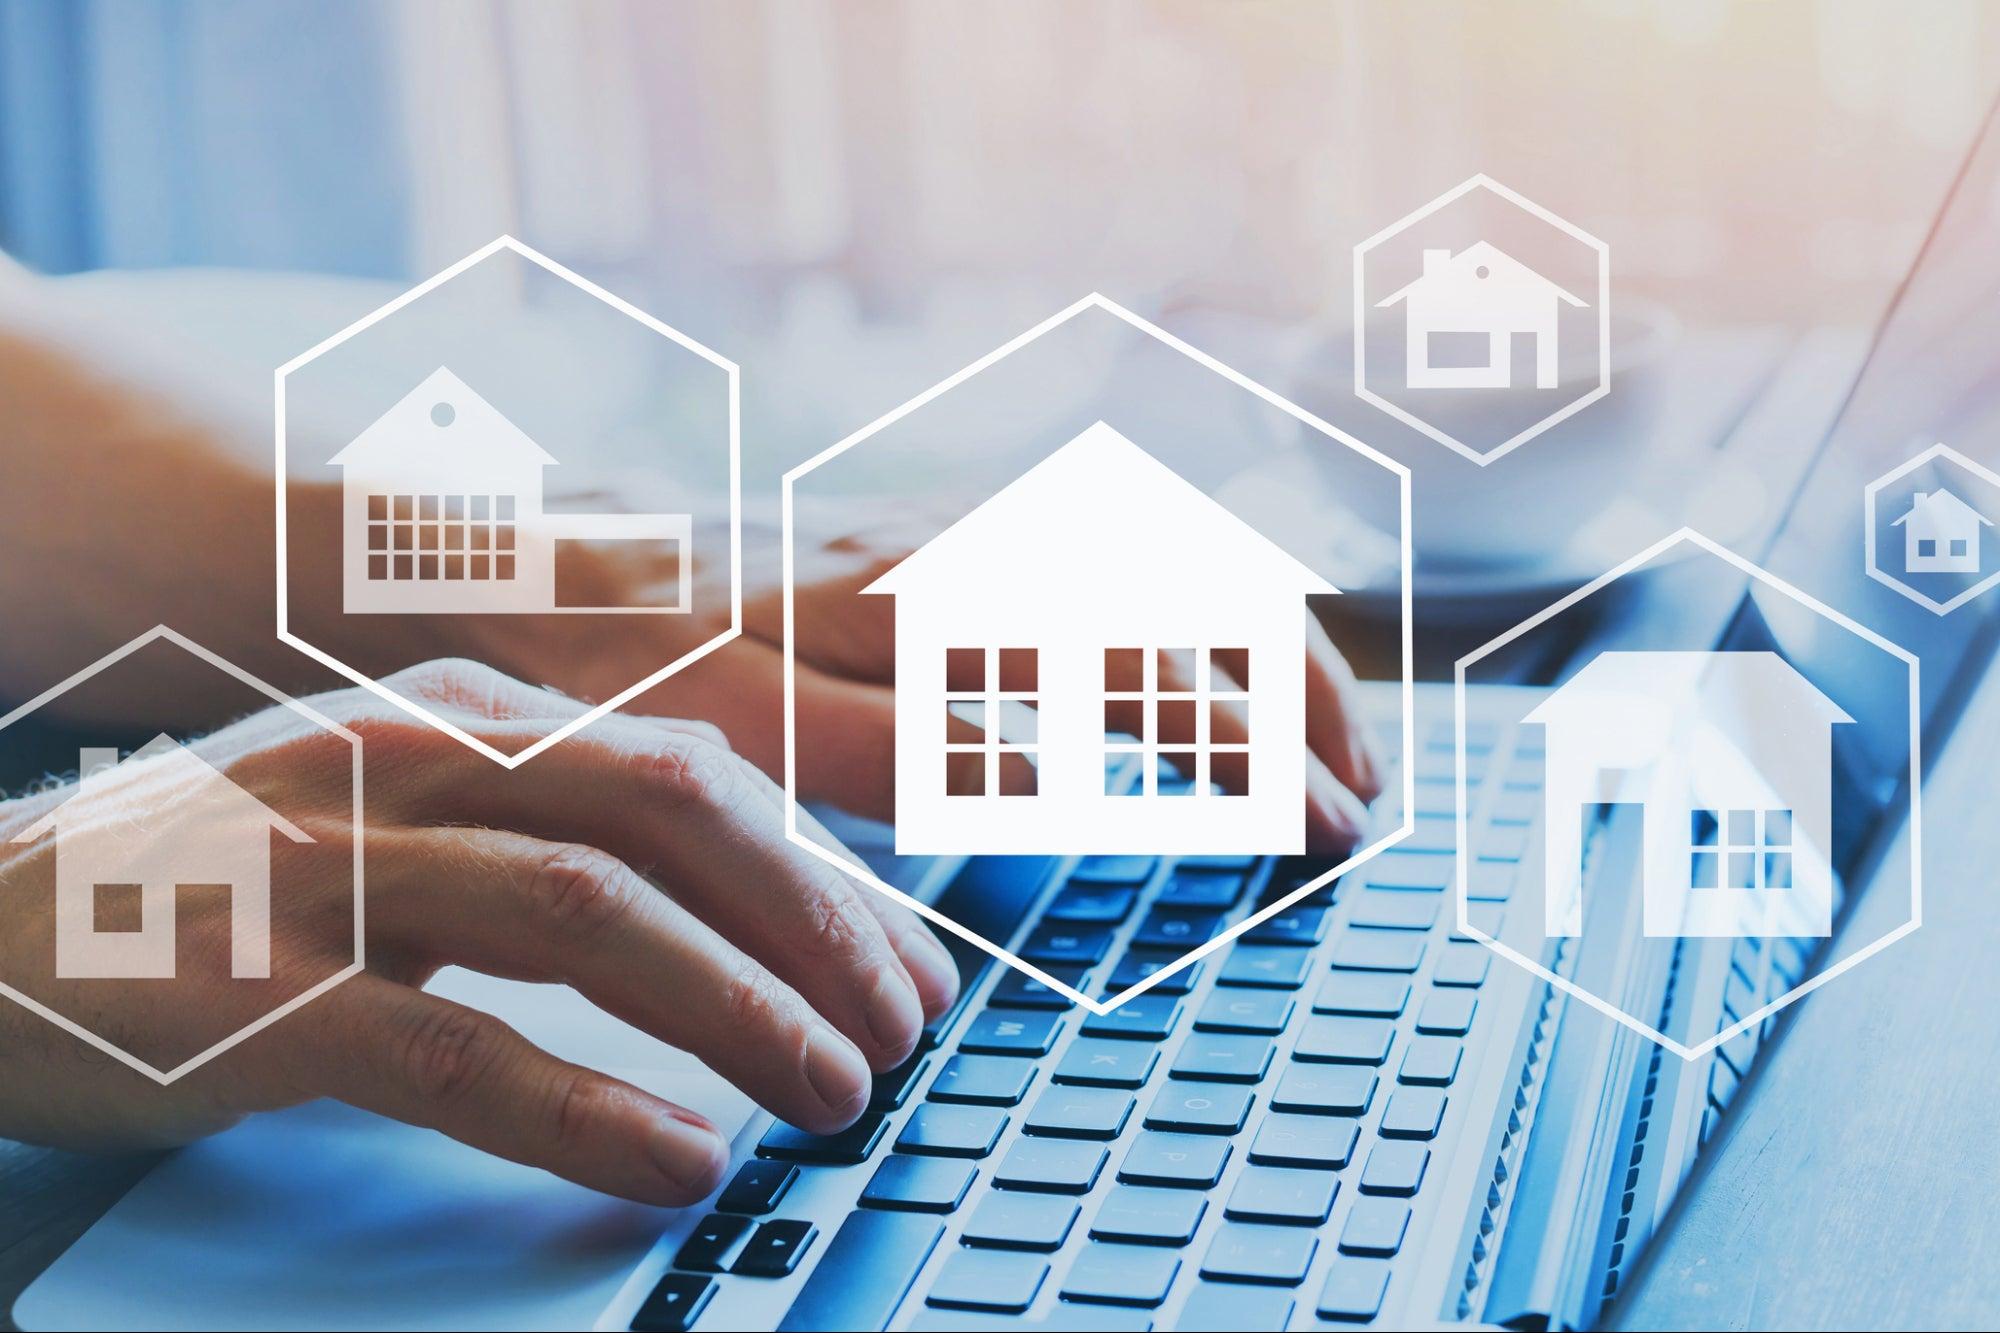 , Creative Online Marketing Ideas for Real Estate Success, Saubio Making Wealth